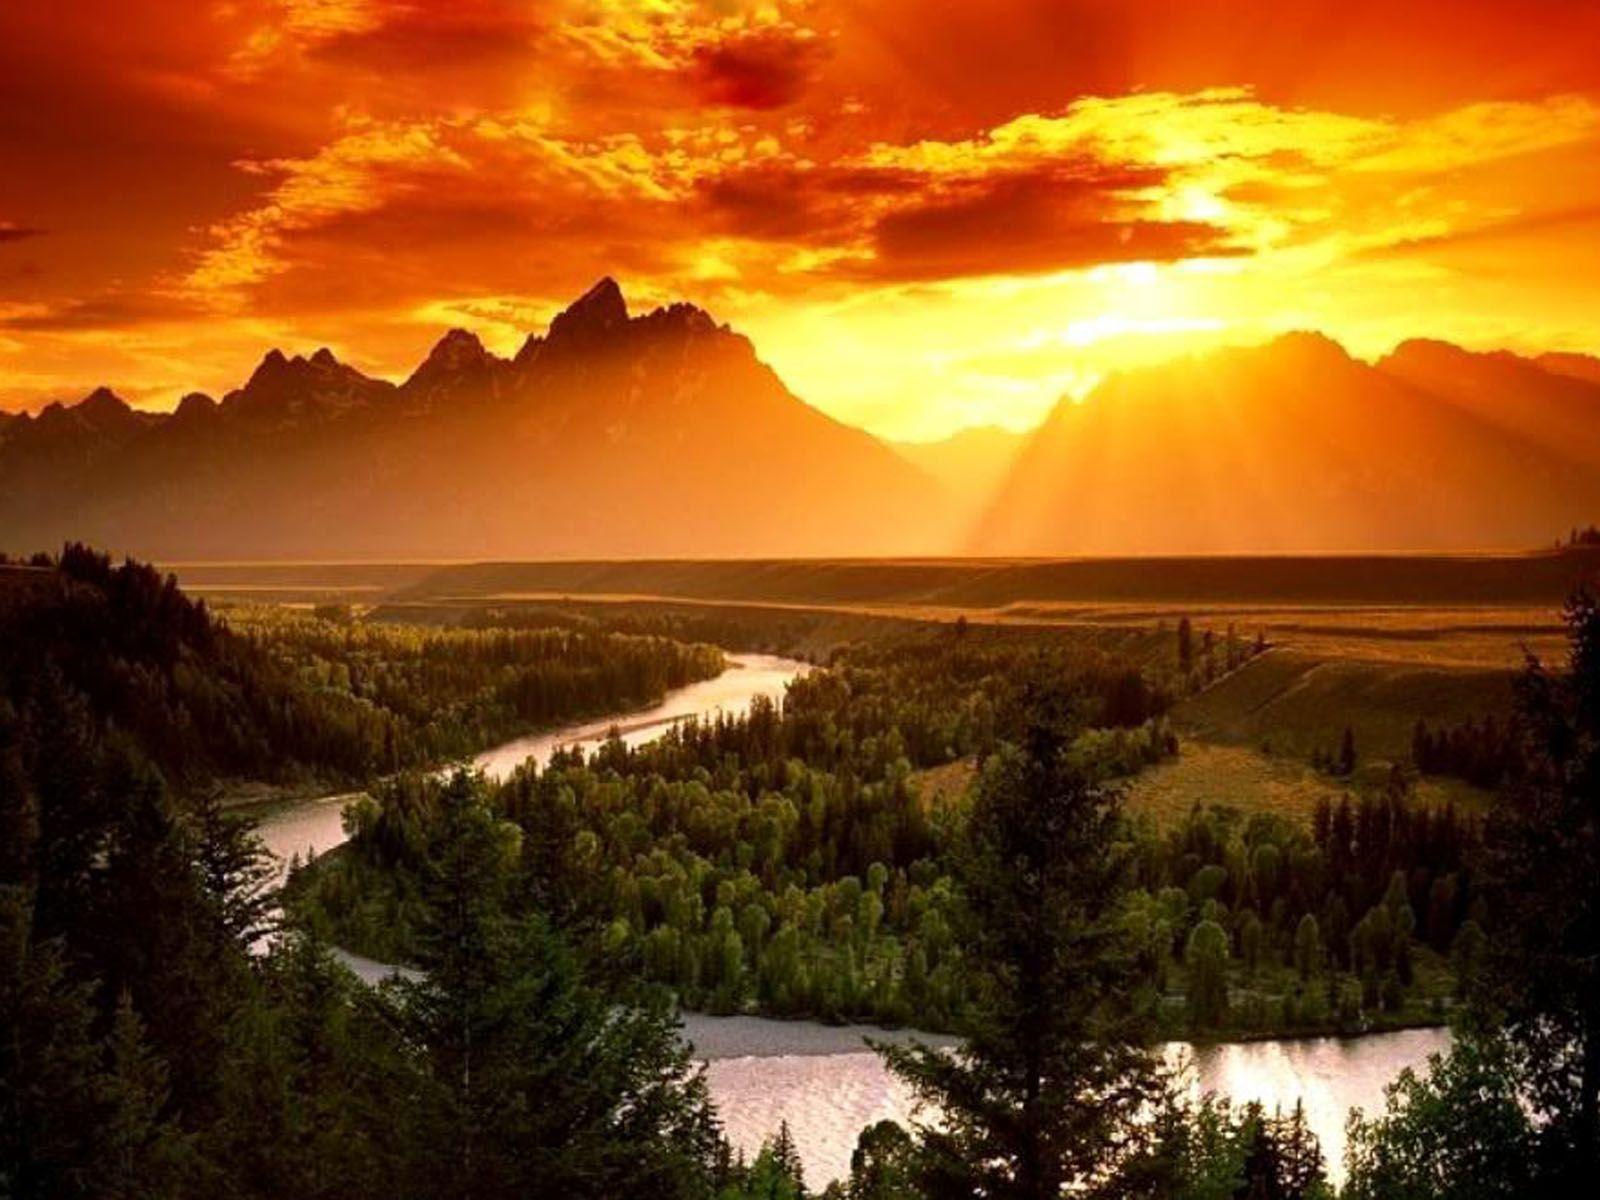 Mountain Sunrise Wallpapers 1 | Thorson Coaching